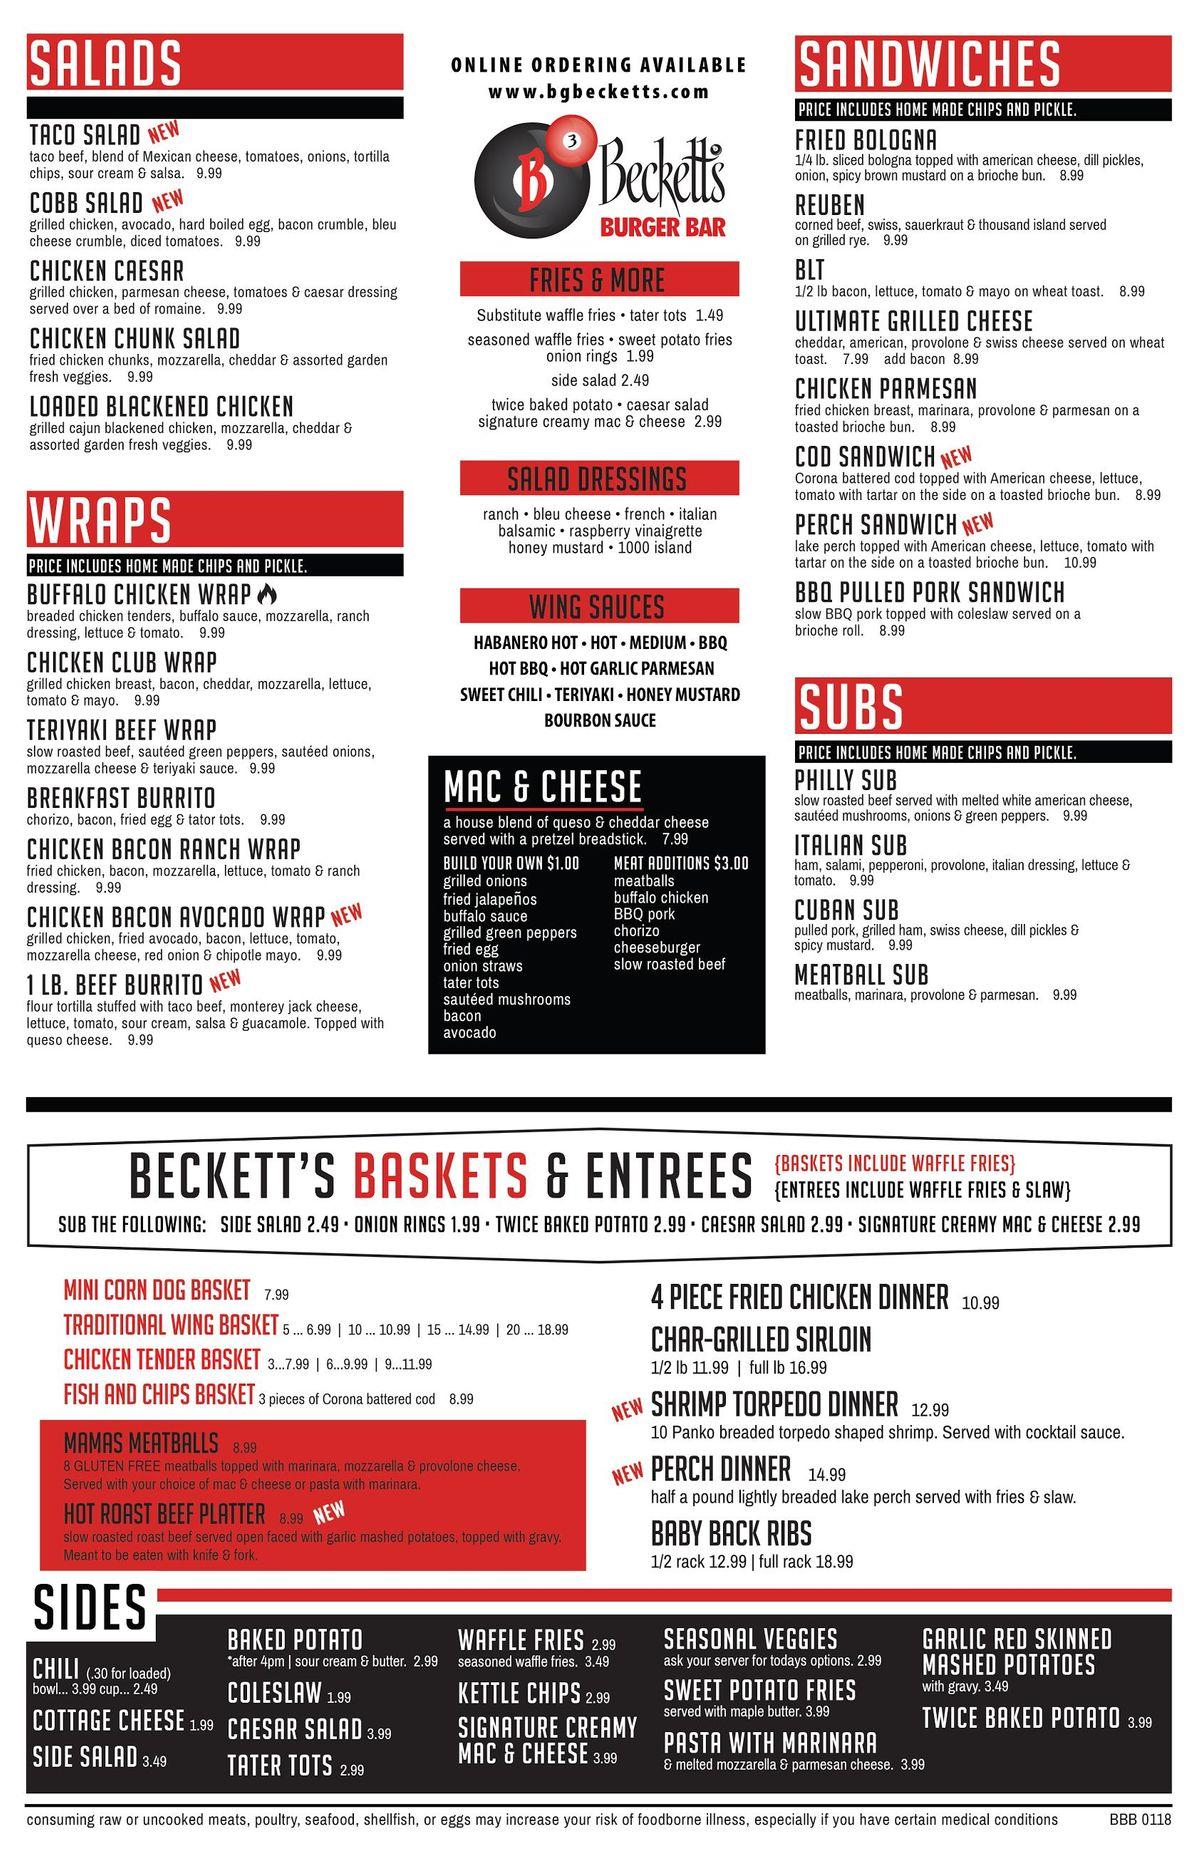 becketts-menu-2.jpeg